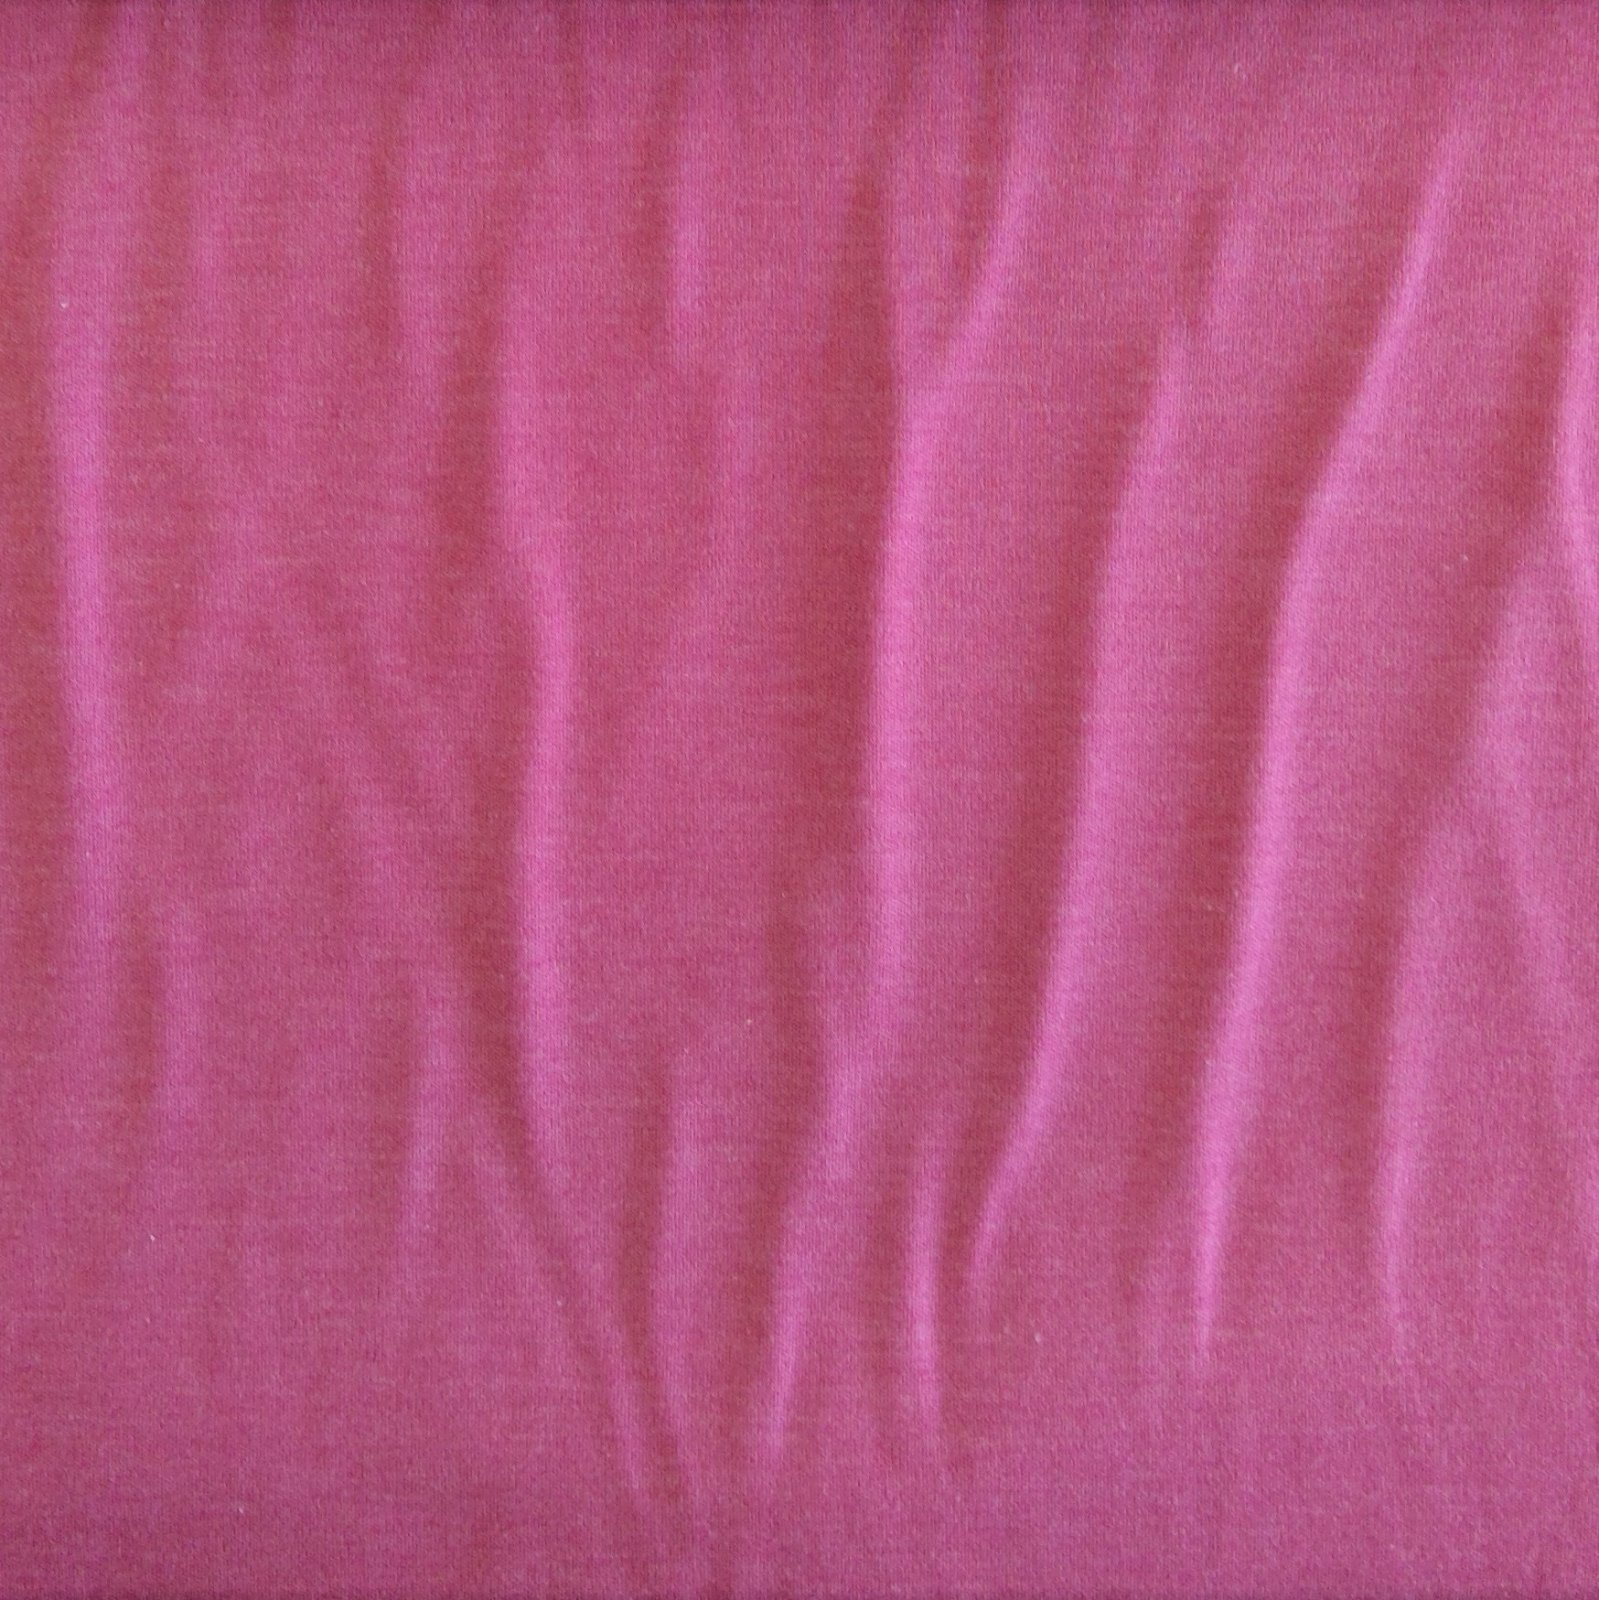 T-Shirt Interlock Cotton Blend Bare Knits Punch